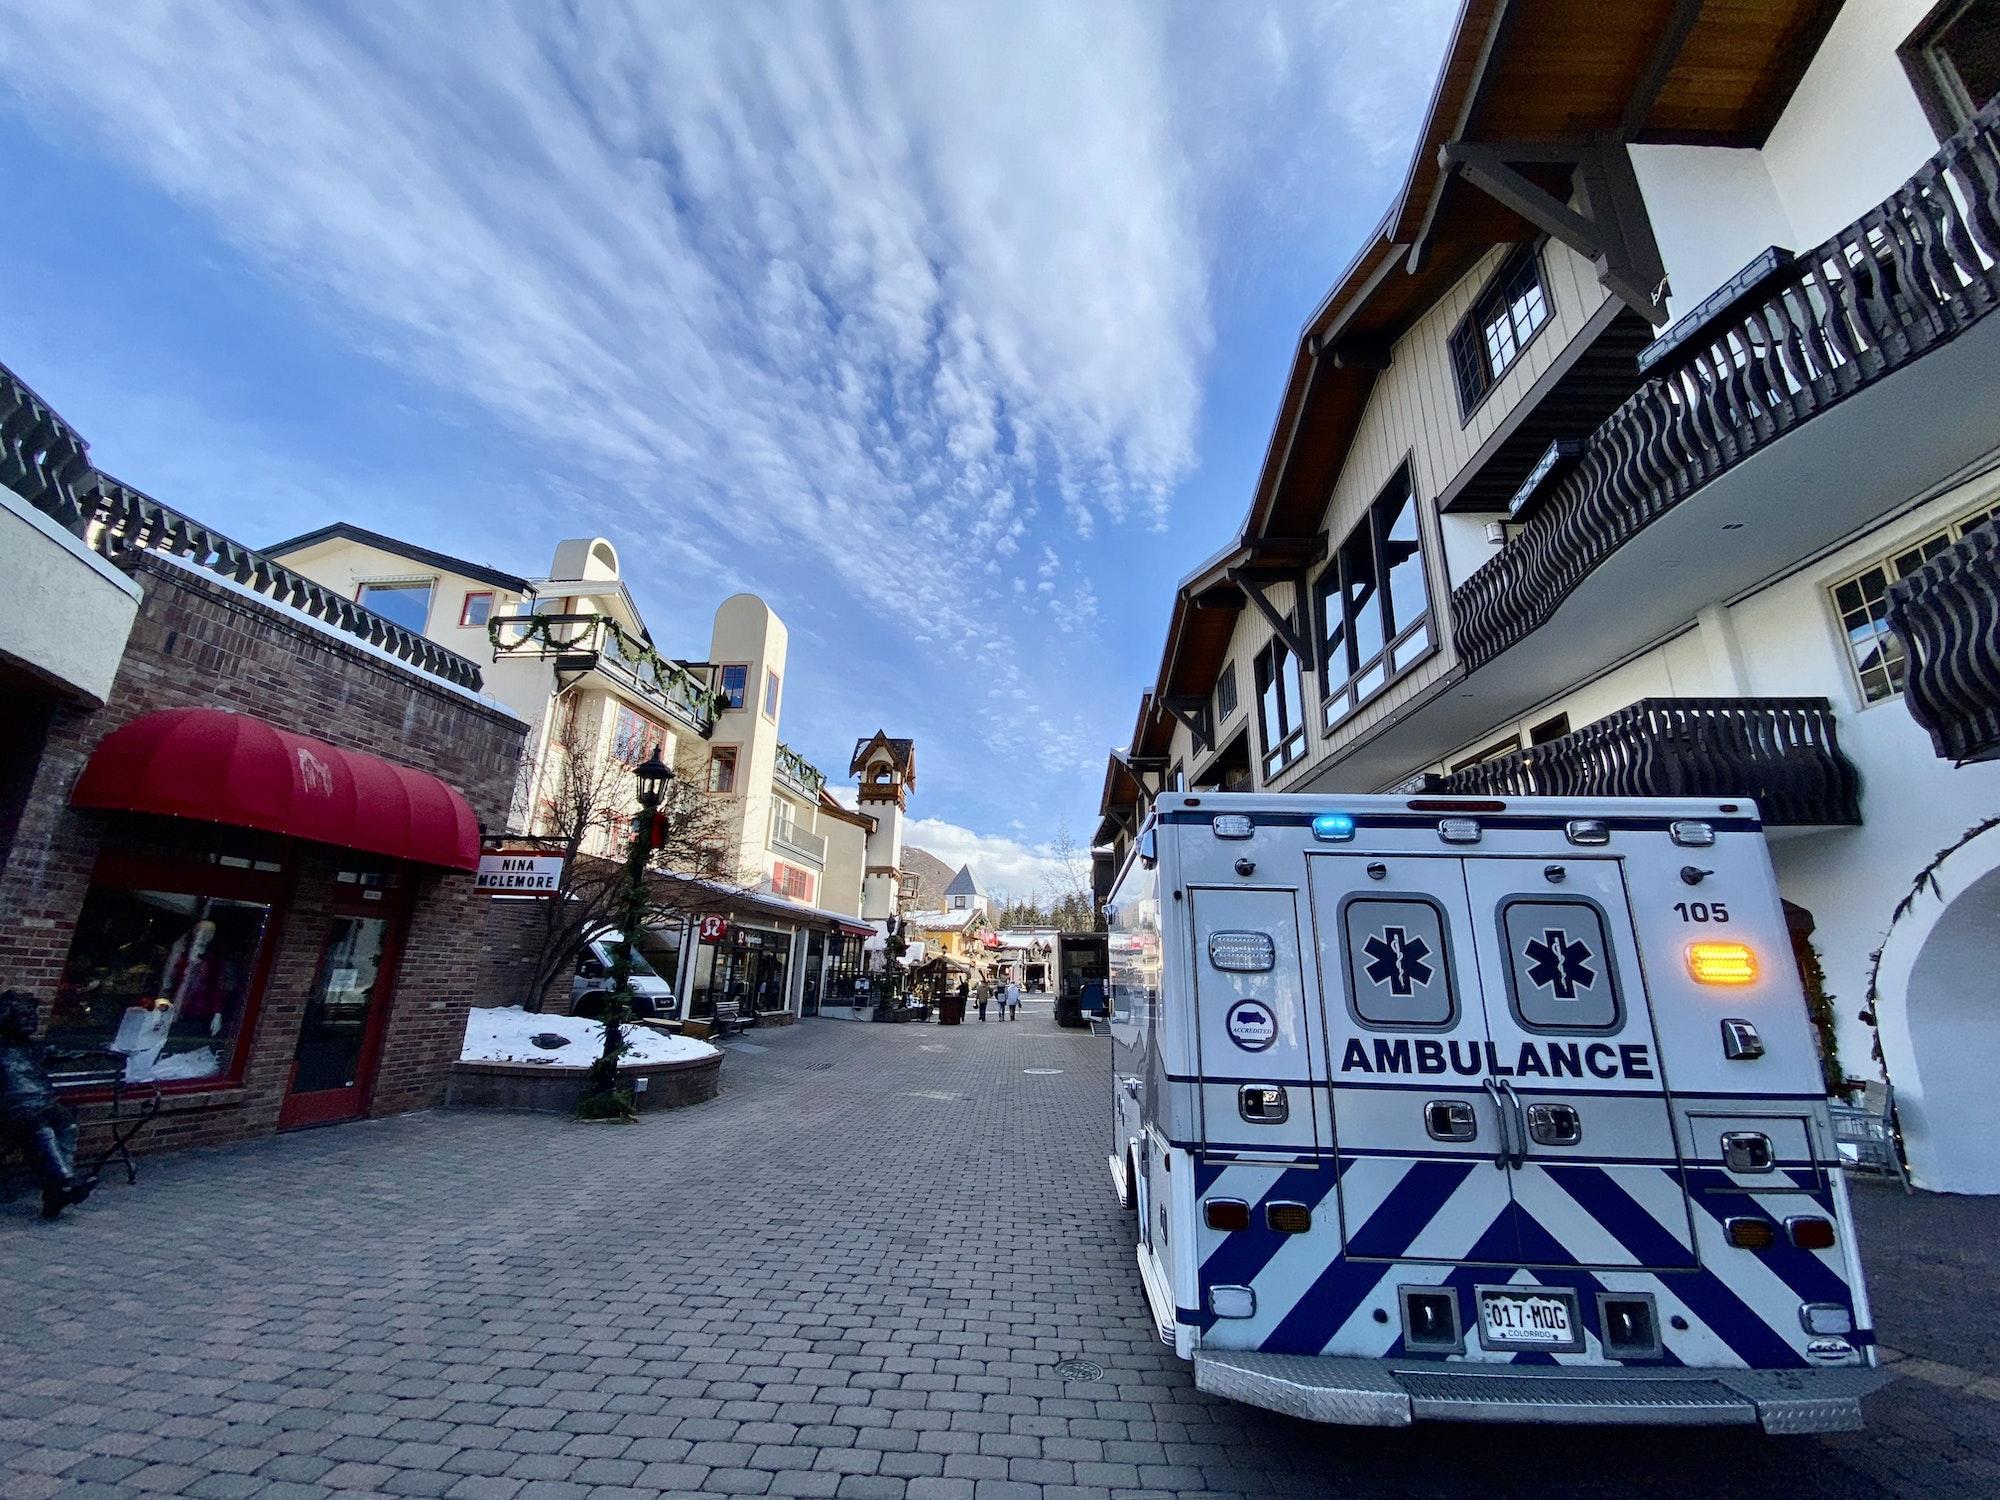 ECPS Amubulance parked in Vail Village